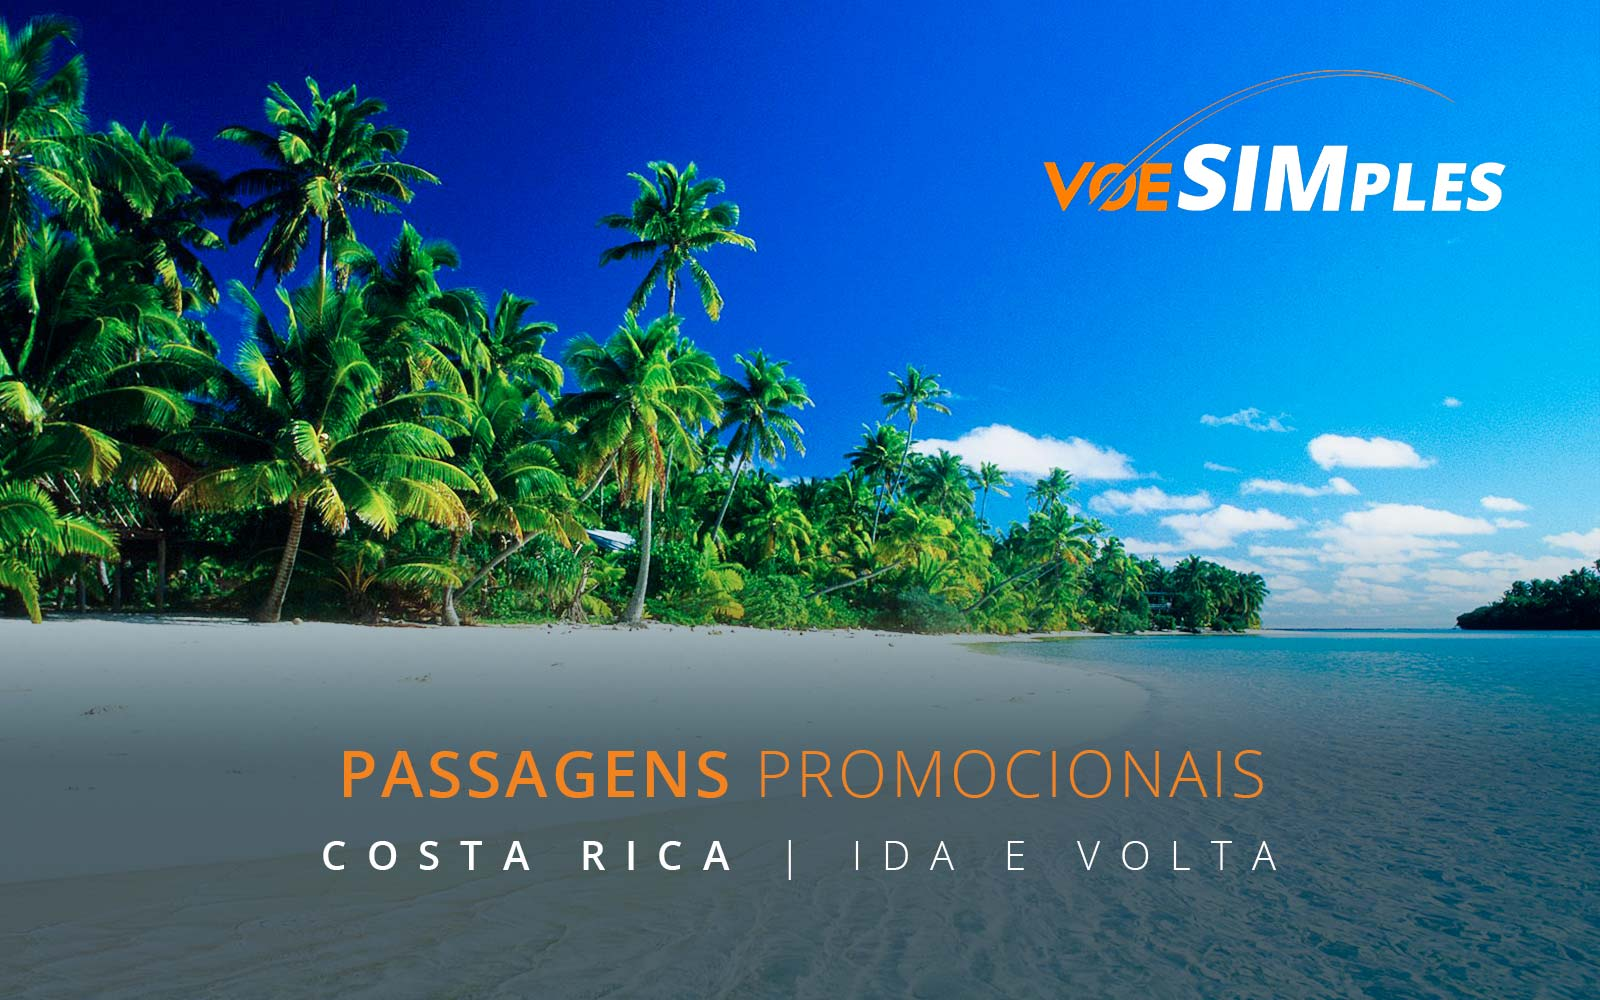 Passagens aéreas promocionais para San José na Costa Rica